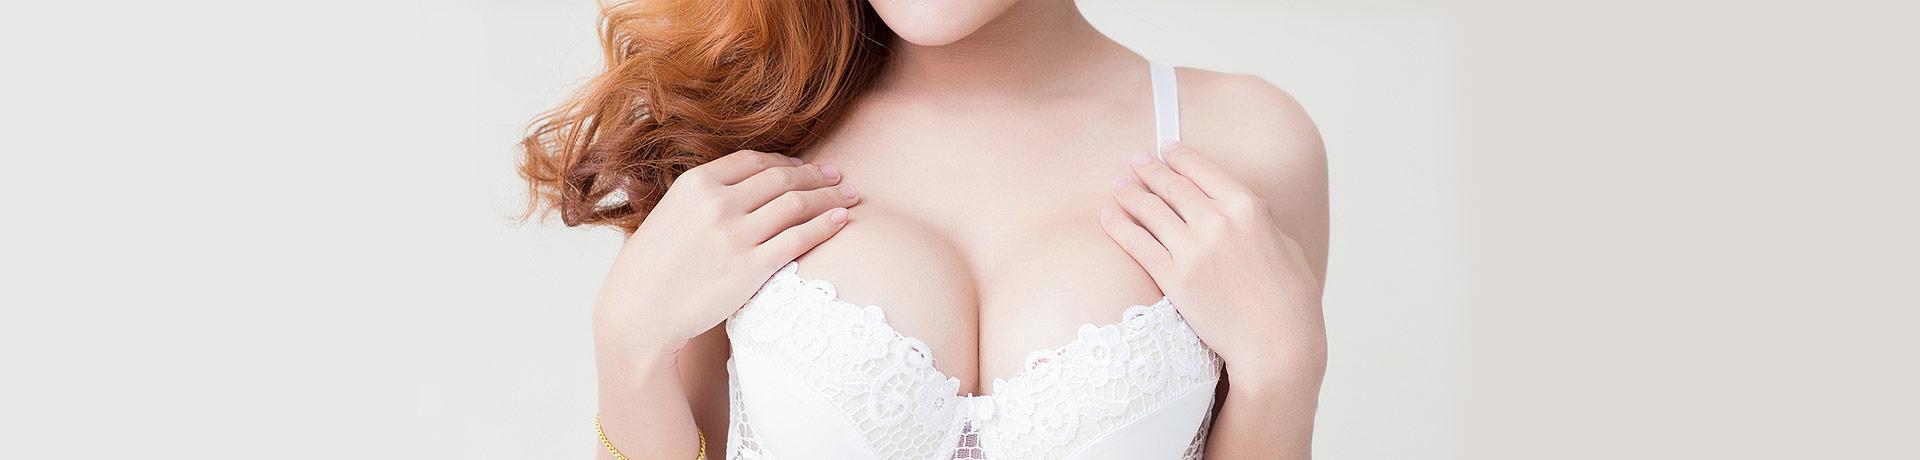 Brustvergrößerung München - Brustimplantate aus Silikon